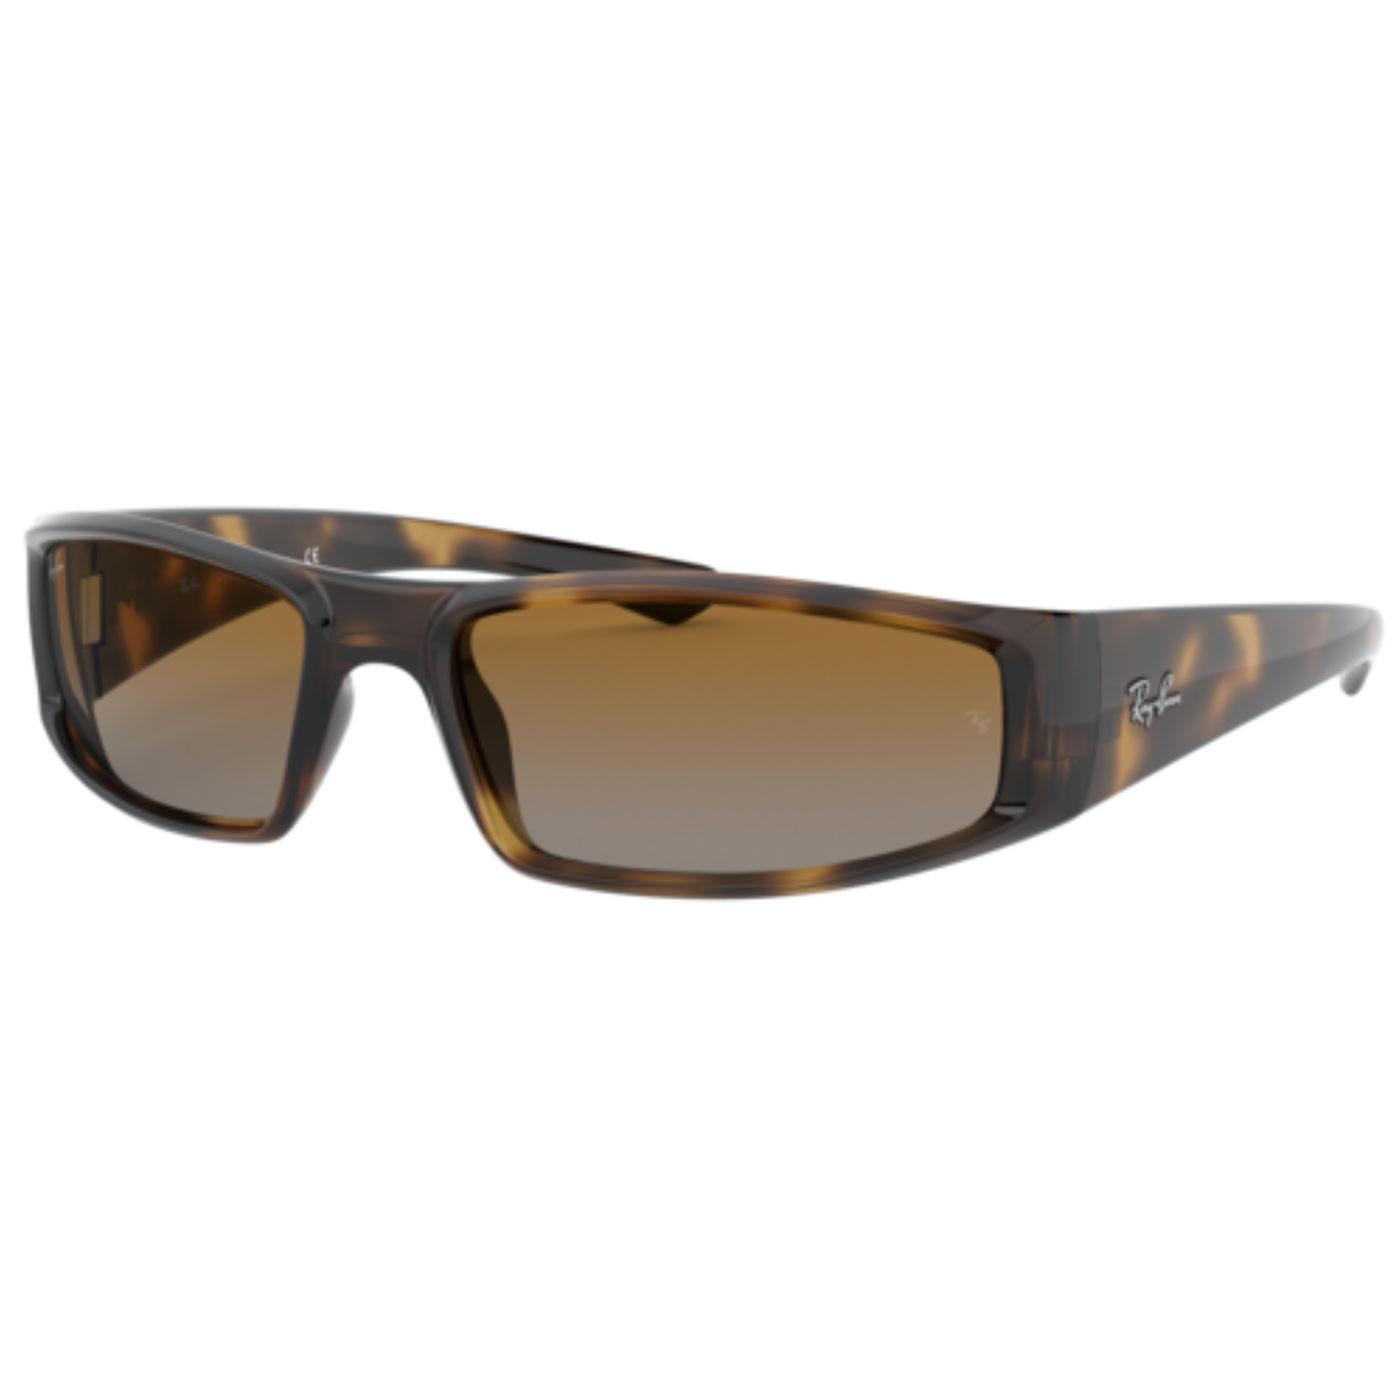 RAY-BAN RB4335 Retro Wrap Round Sunglasses HAVANA